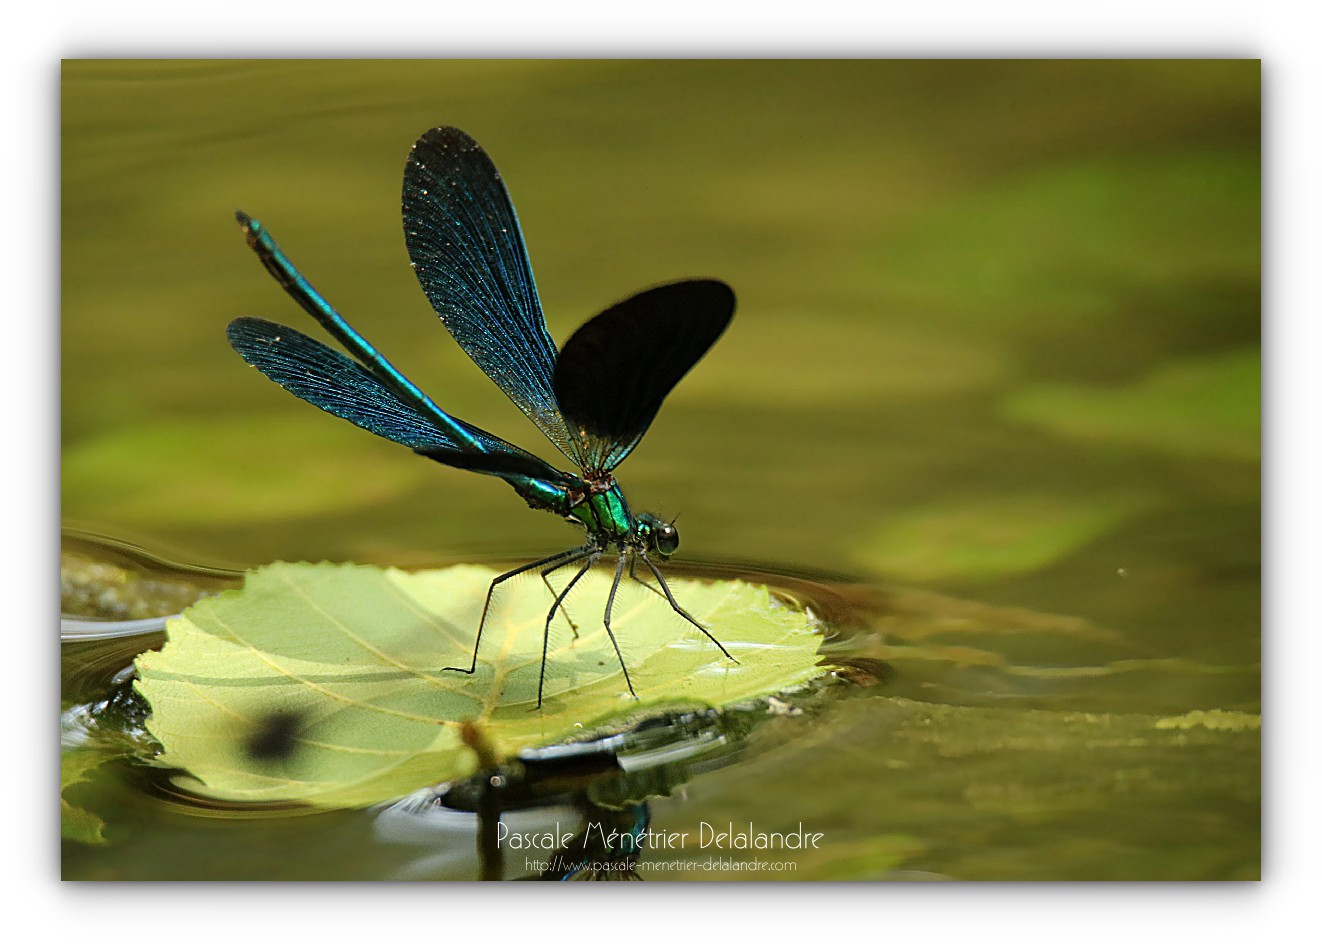 Caloptéryx vierge - Calopteryx virgo ♂